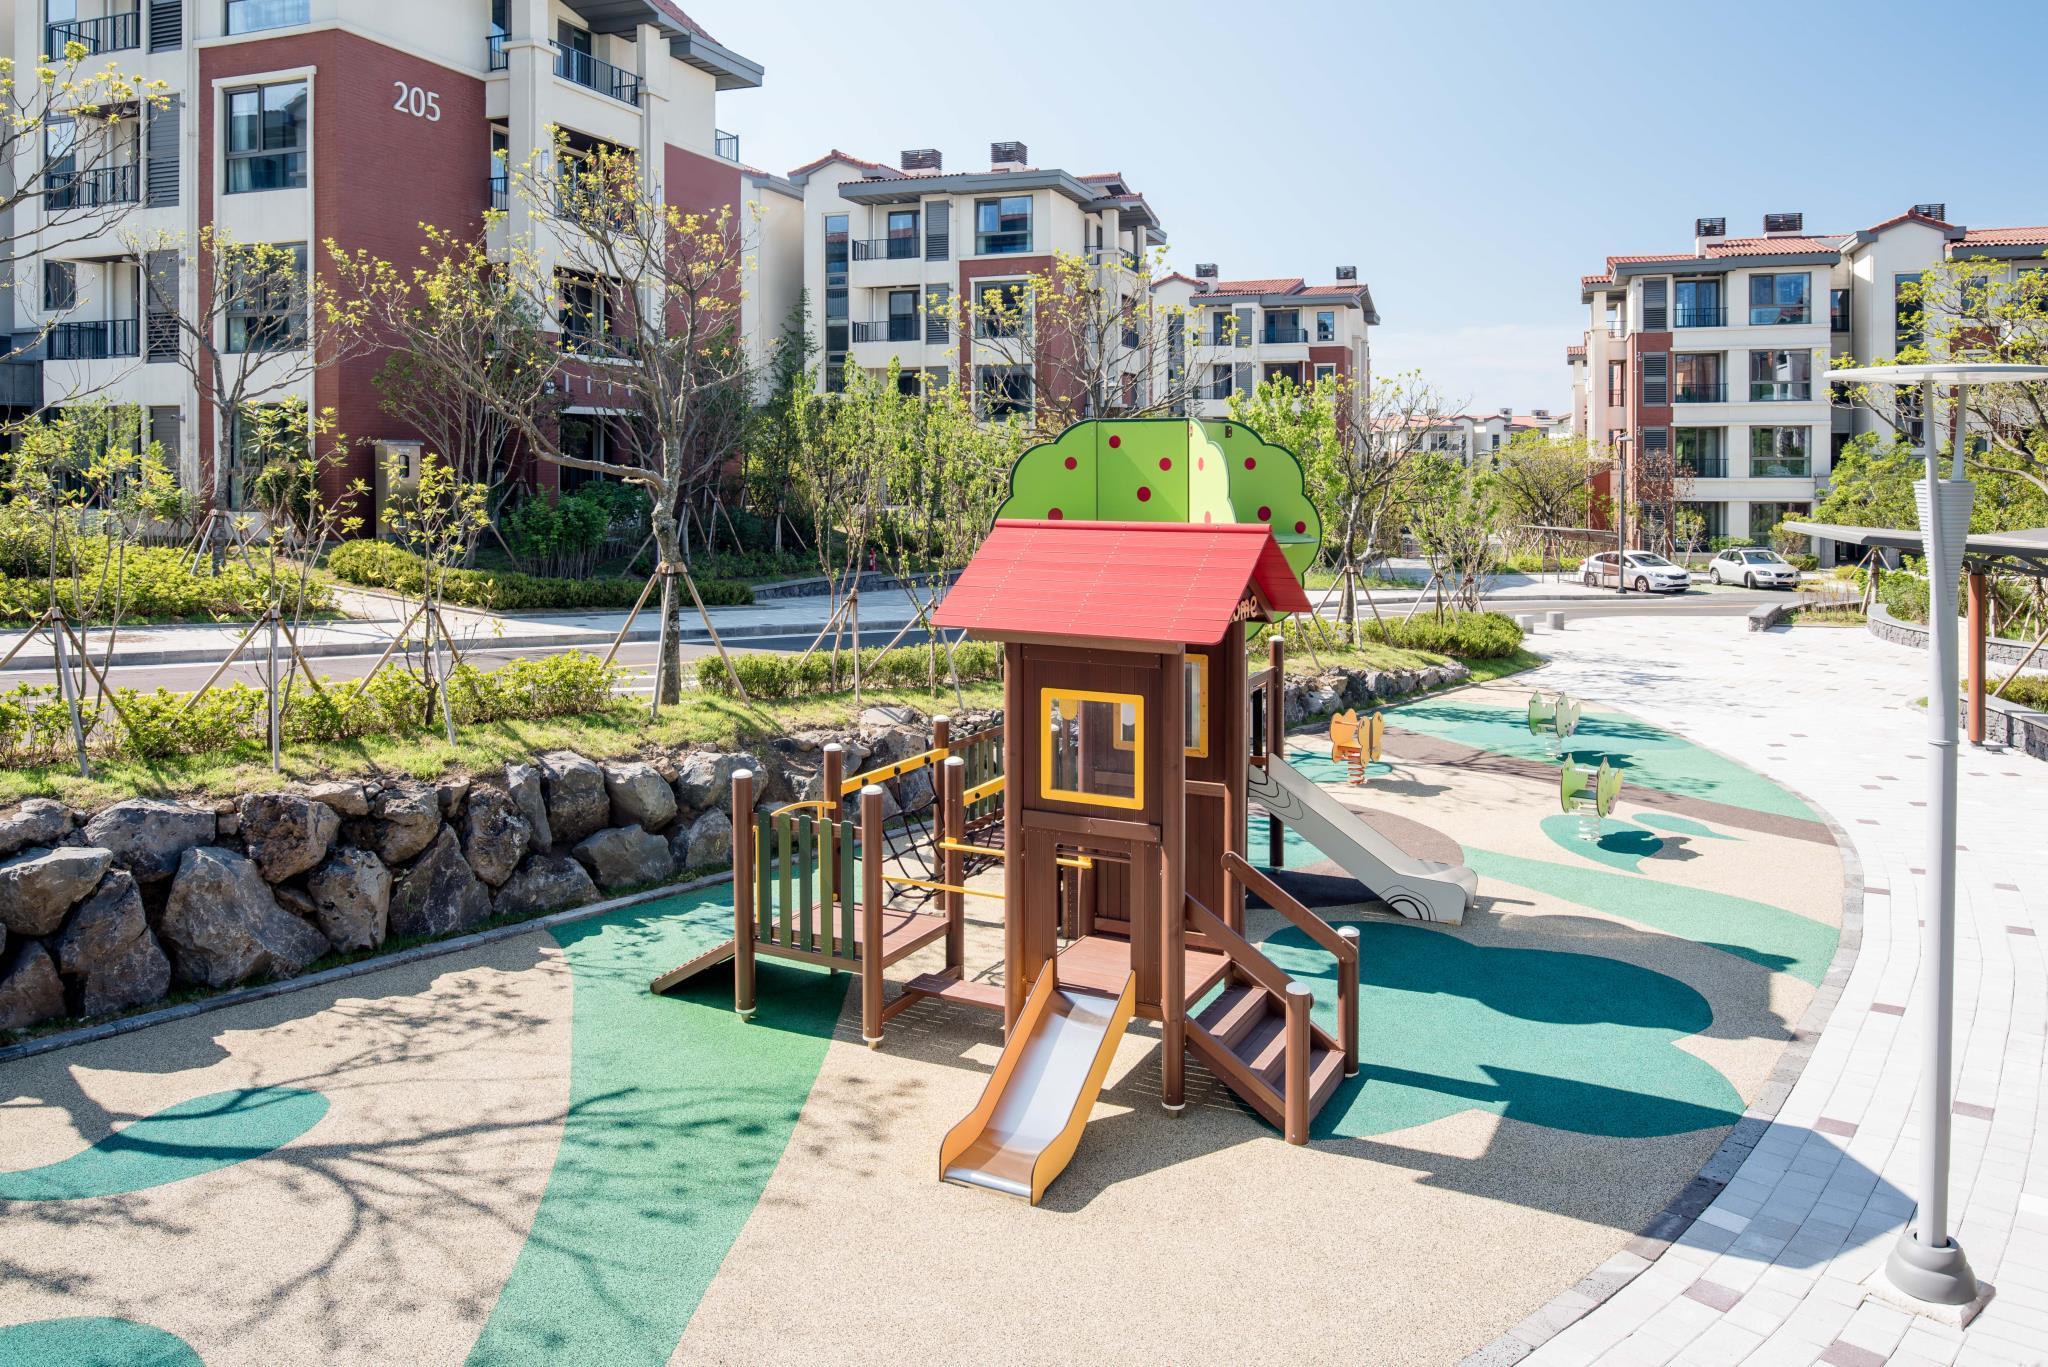 Promo [85% Off] Goodstay Nomad Pension In Jeju South Korea | B Hotel Malta Booking